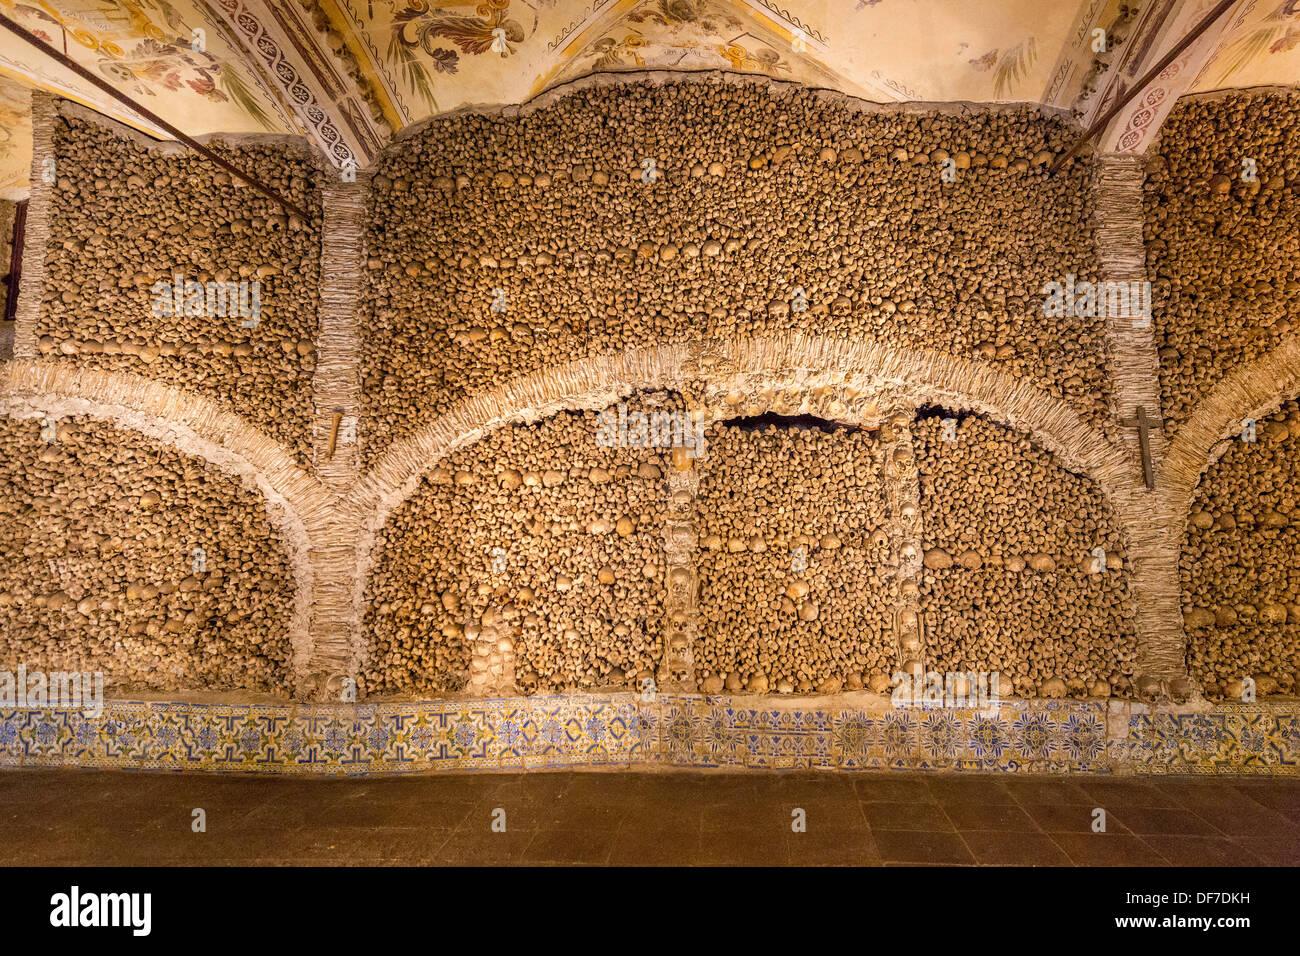 Stacked bones and skulls in the ossuary, Capela dos ossos ...